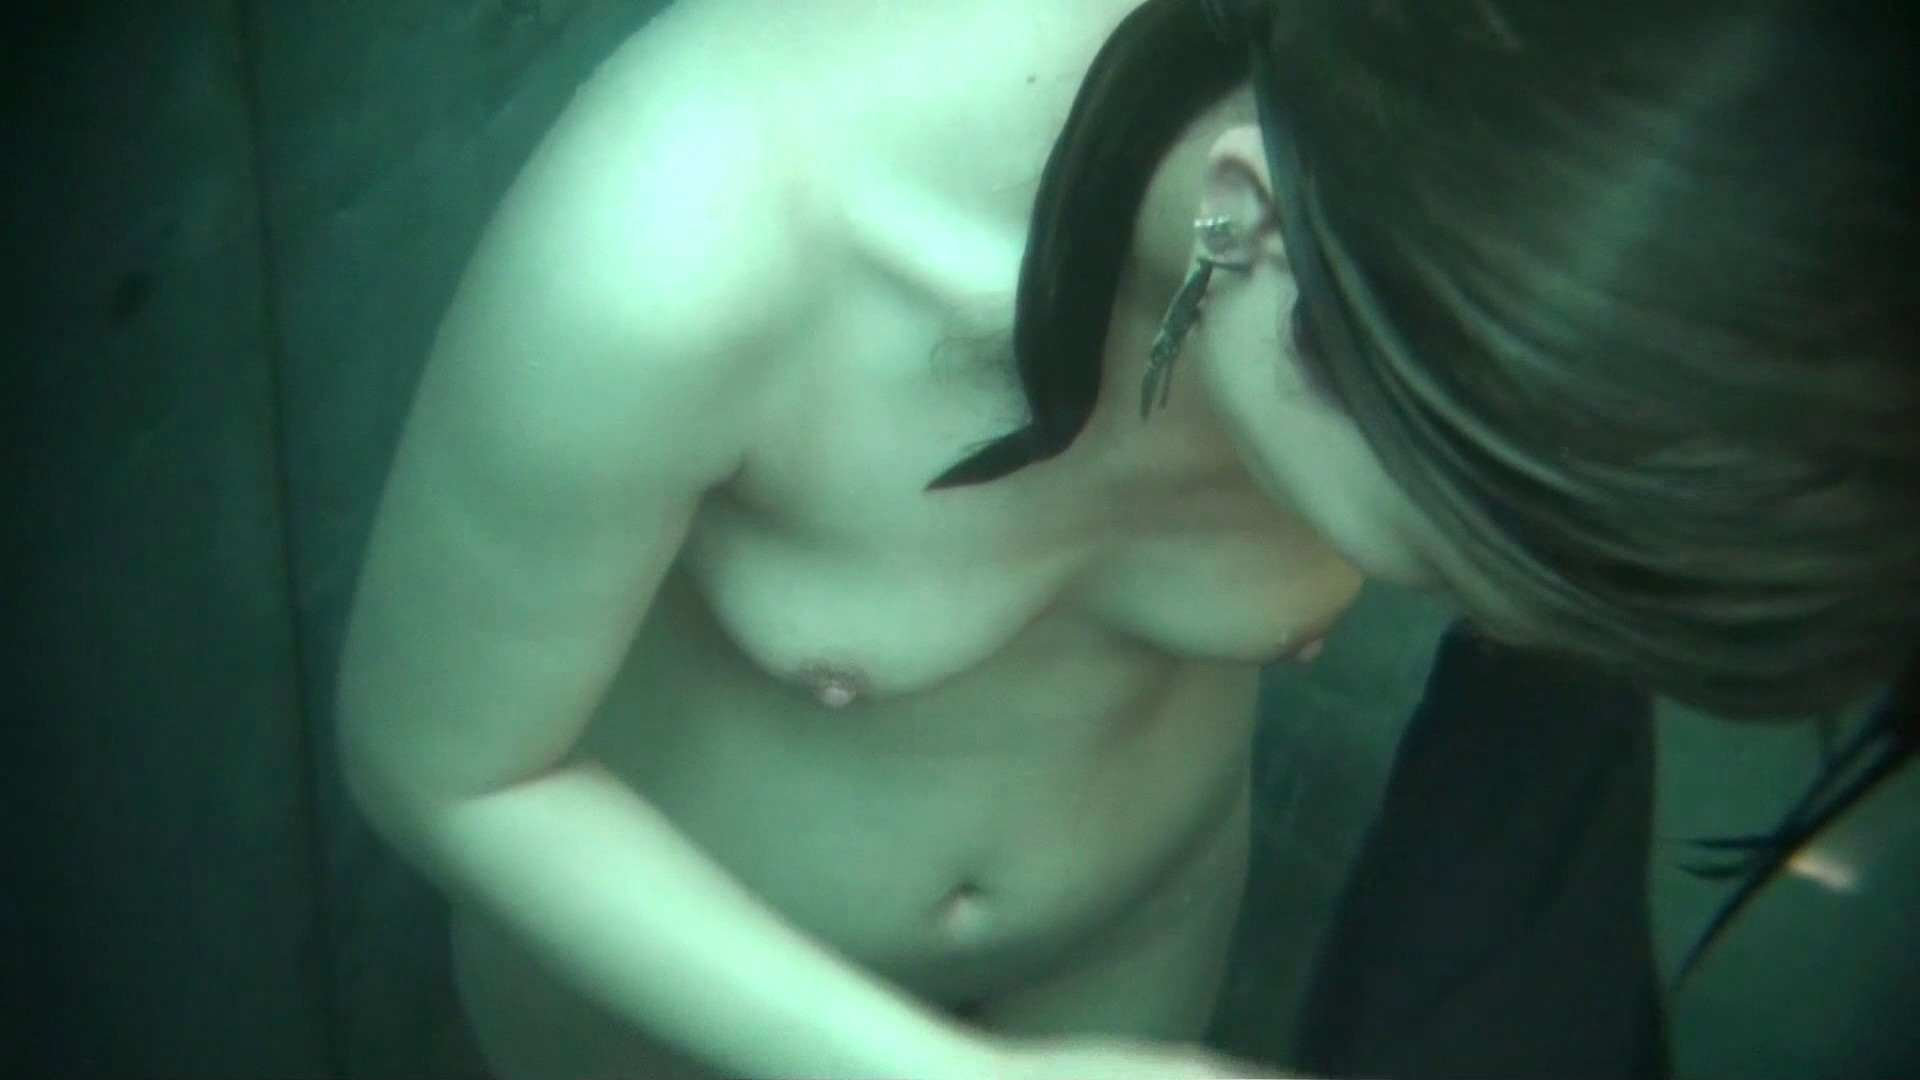 Vol.12 女性の性器には予想外の砂が混入しているようです。 シャワー すけべAV動画紹介 111枚 89